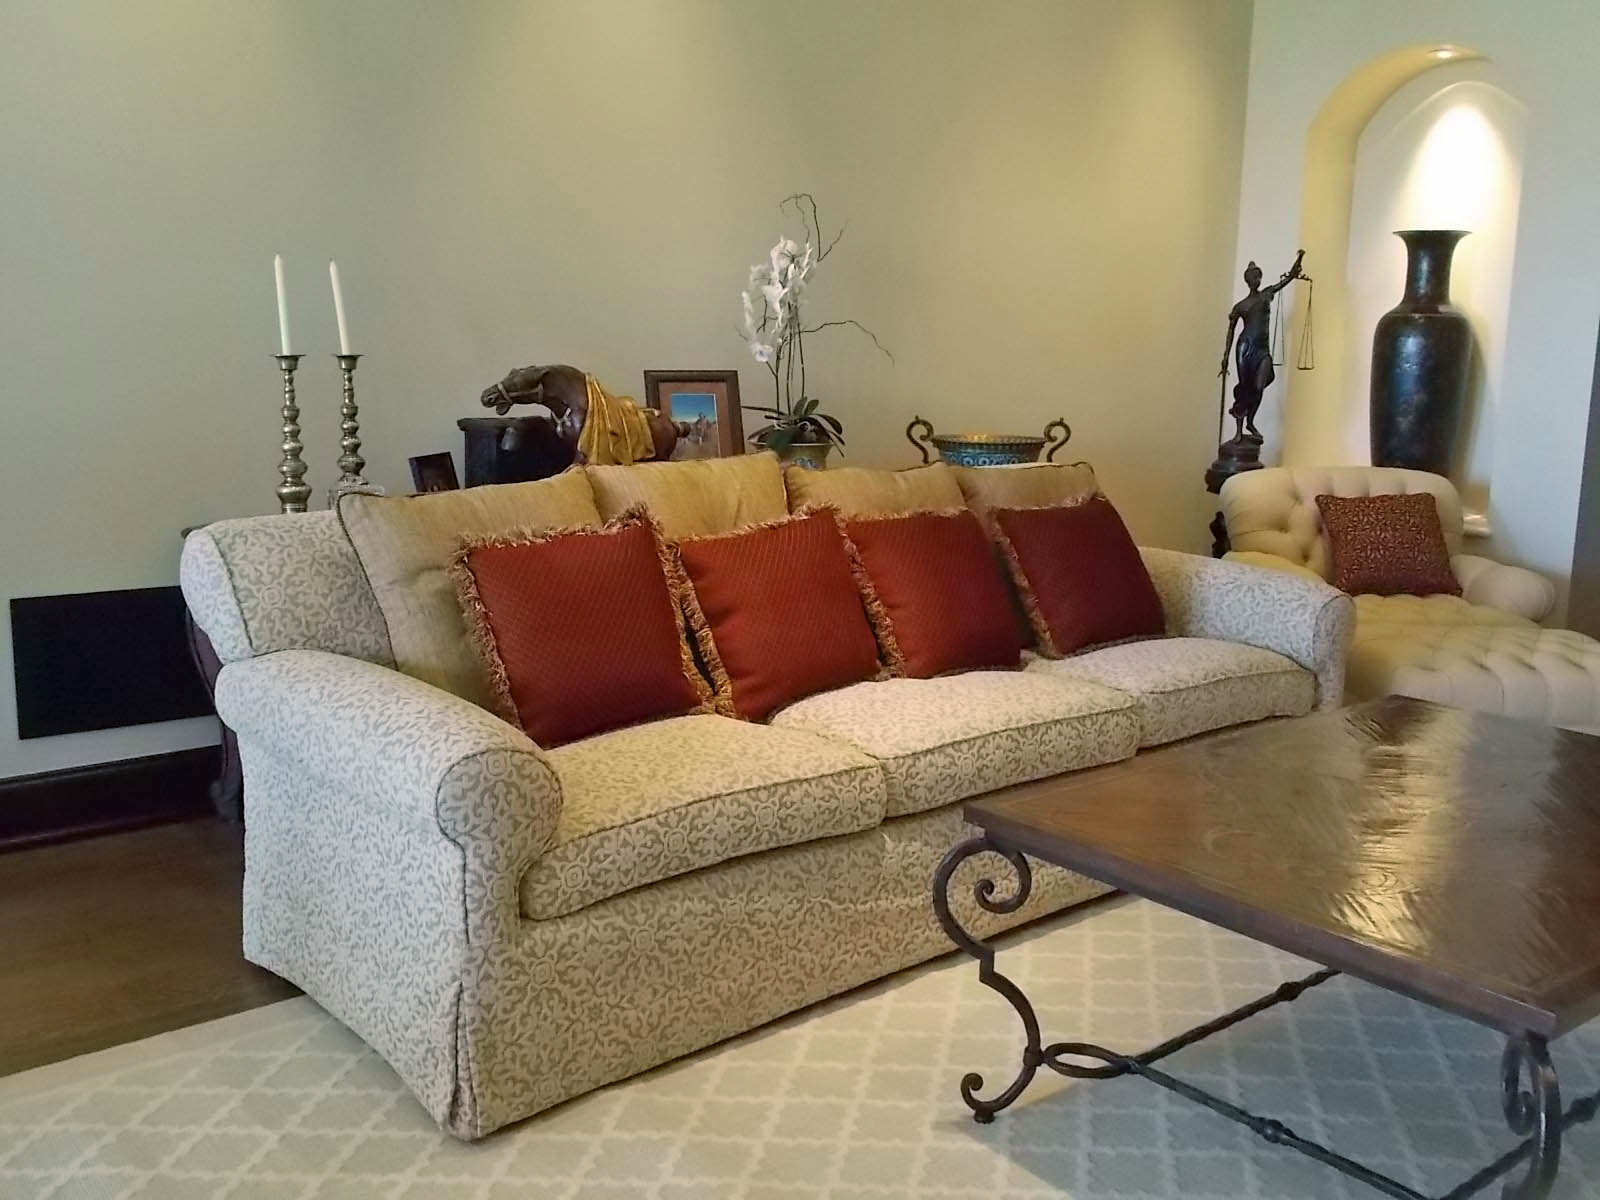 WM Upholstery - Sherman Oaks, CA - Drapery & Upholstery Stores